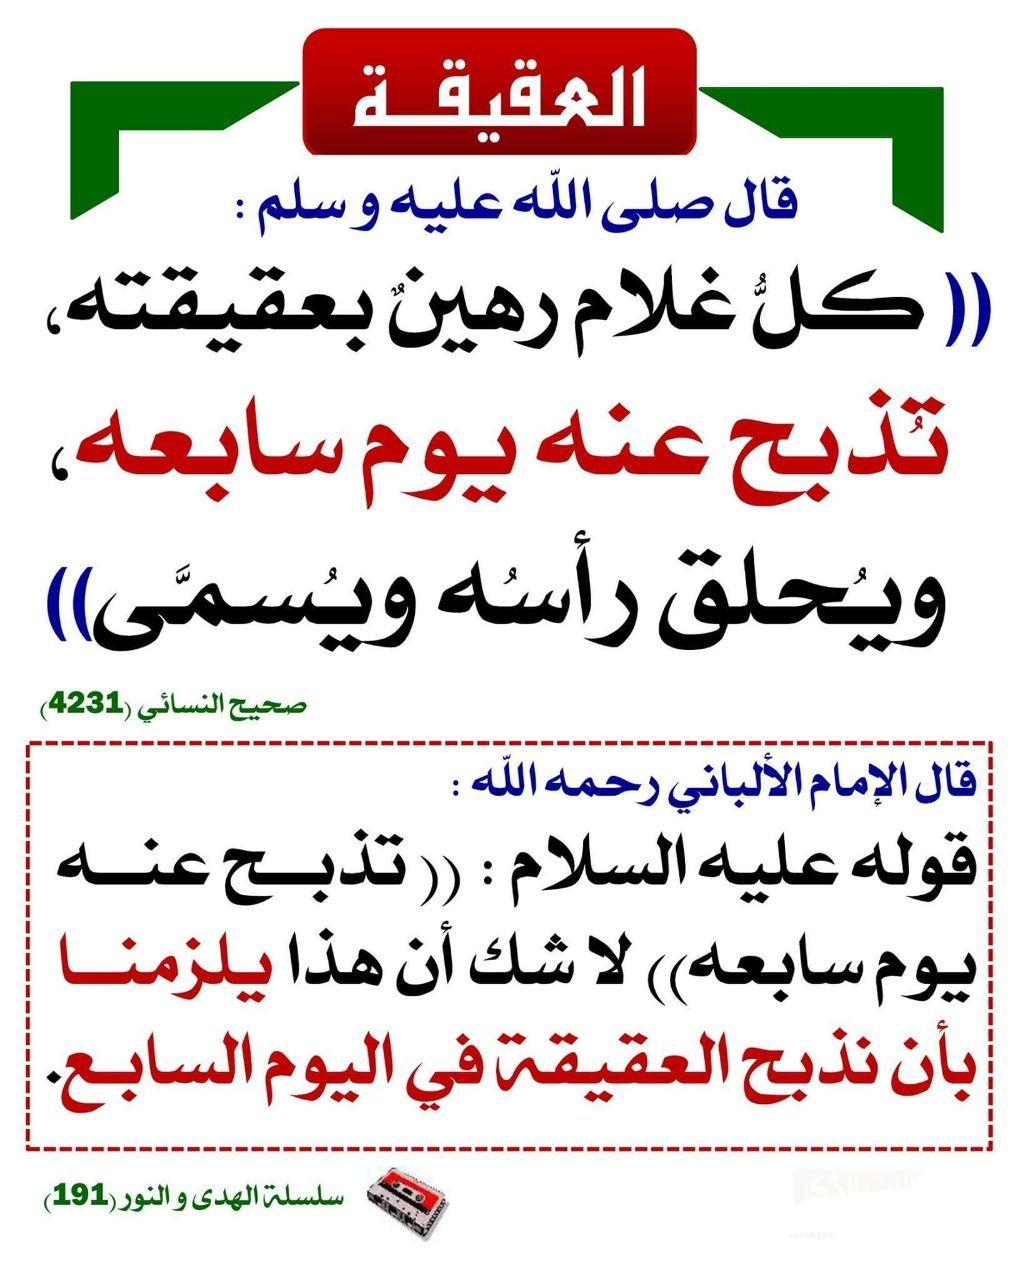 Pin By رورو On أحاديث نبوية Hadith Ahadith Wisdom